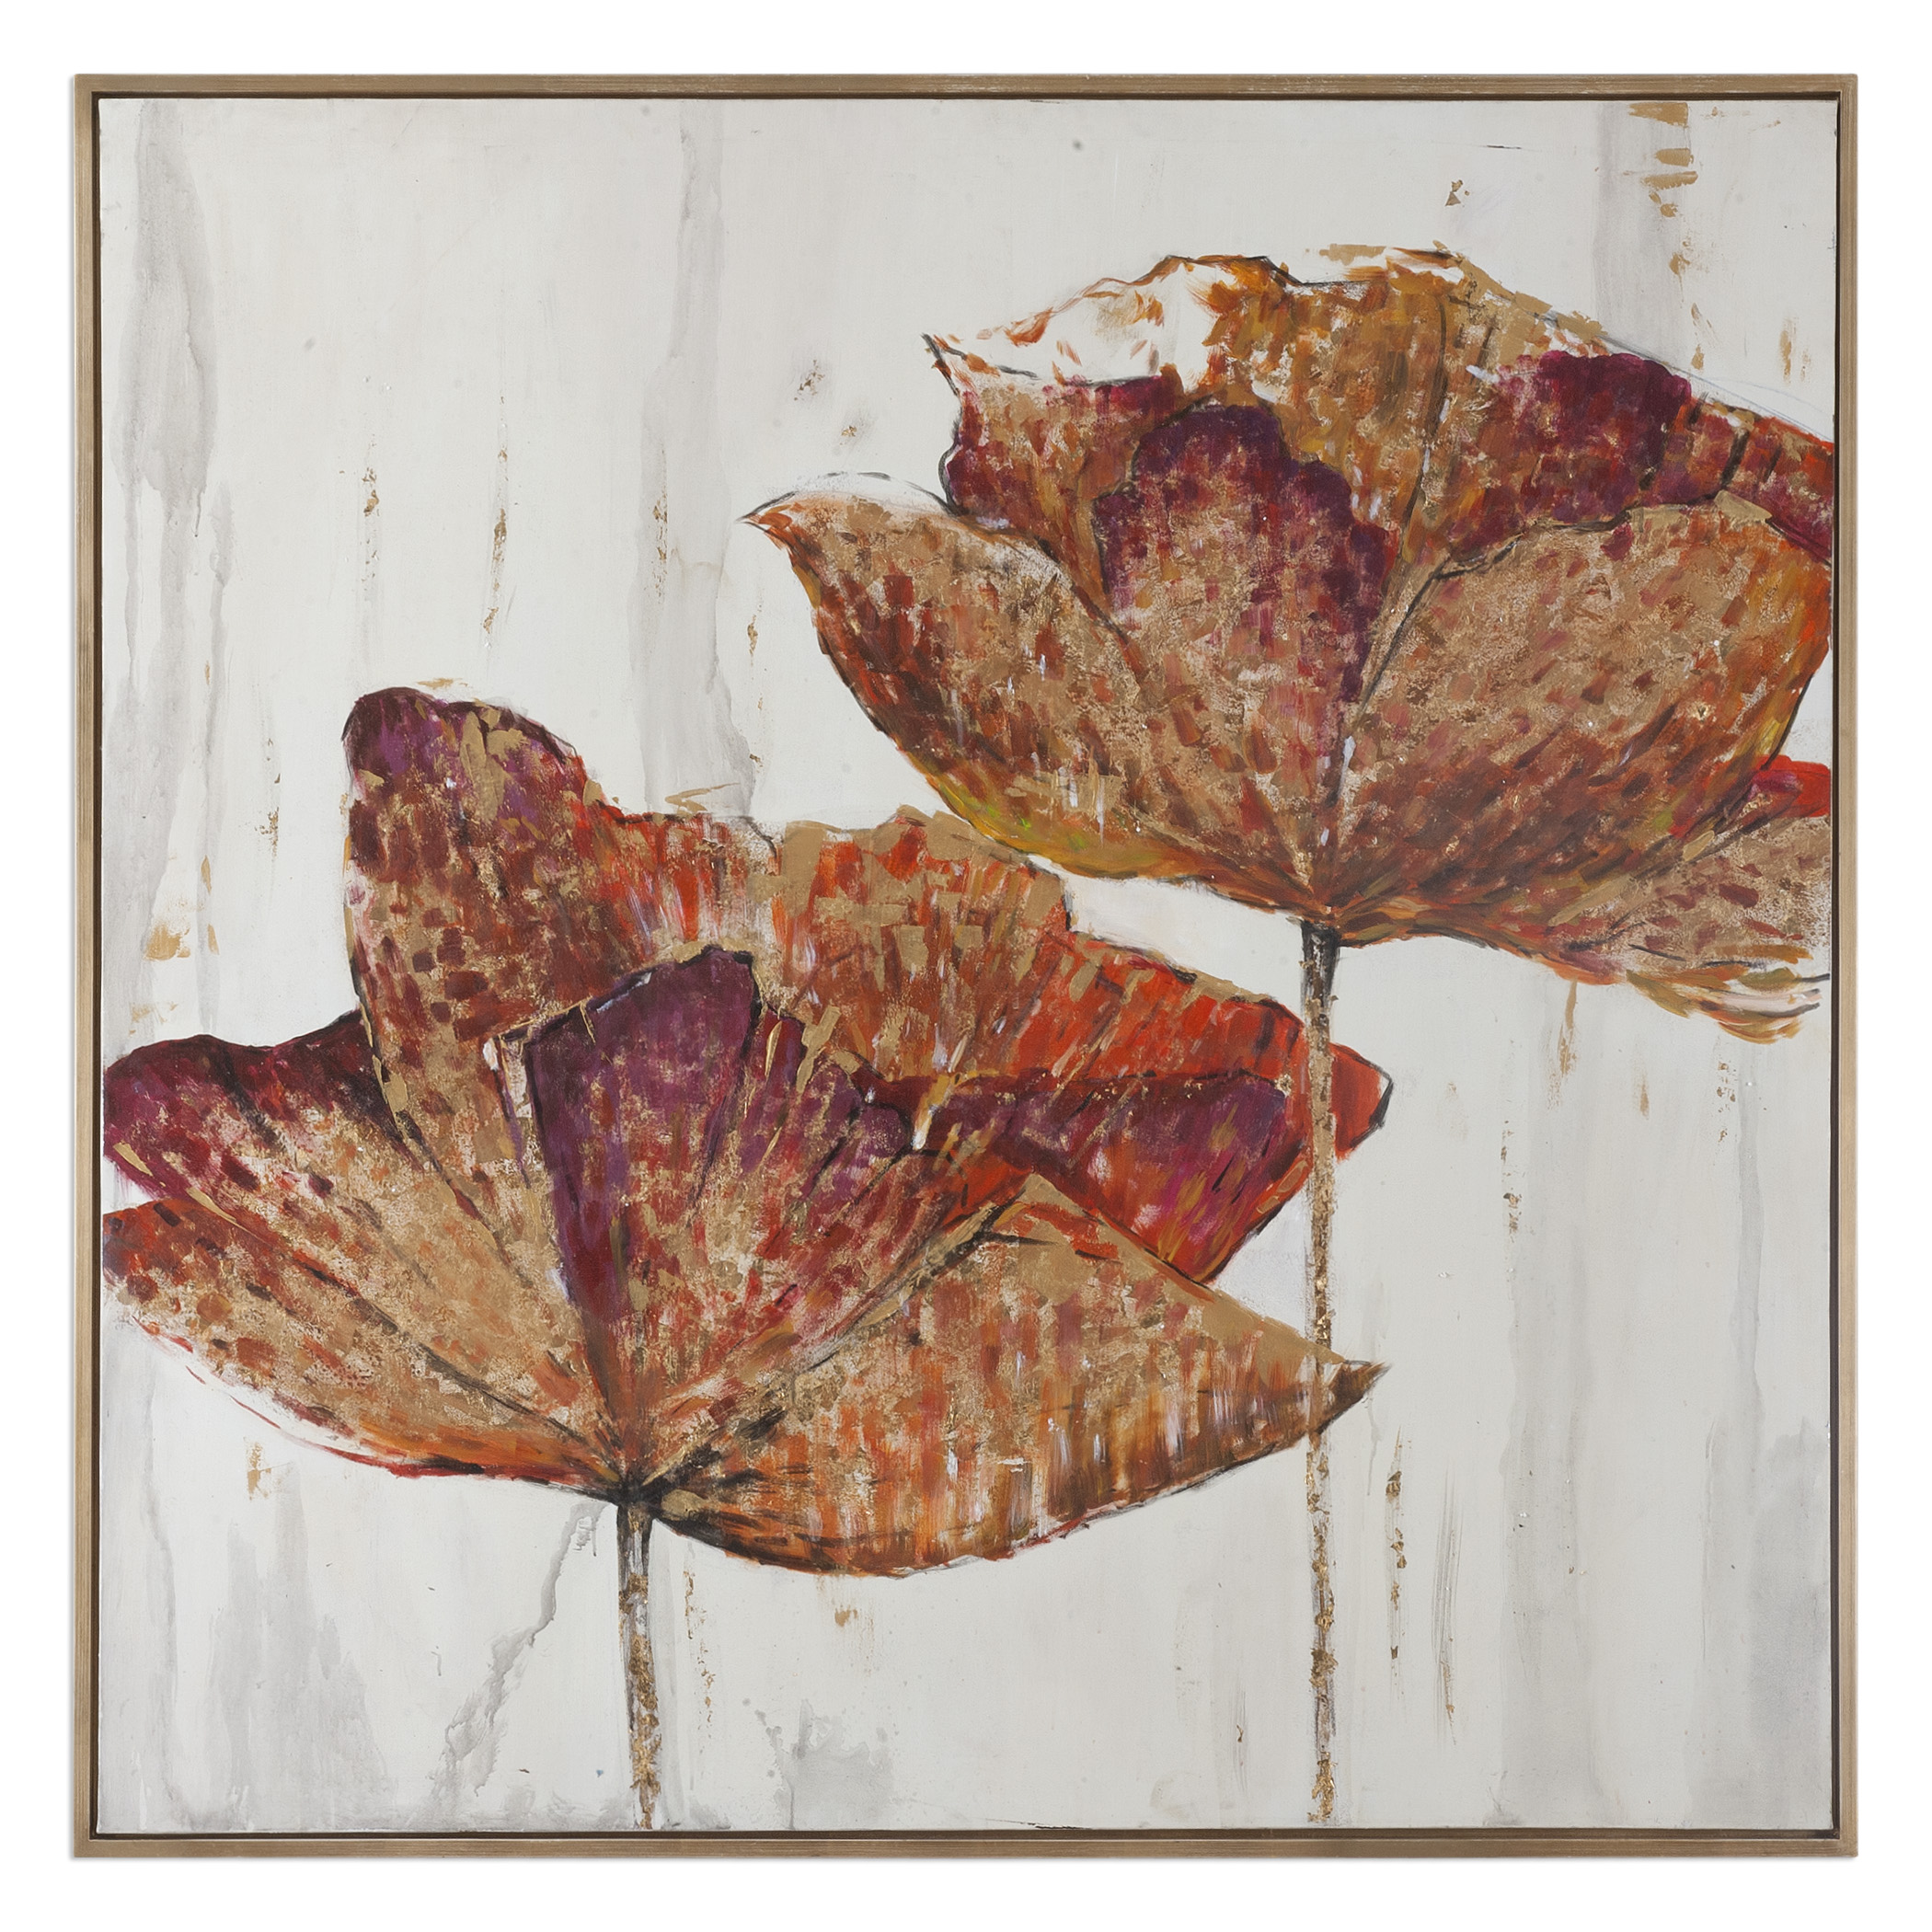 Uttermost Art Golden Accents Floral Art - Item Number: 35326